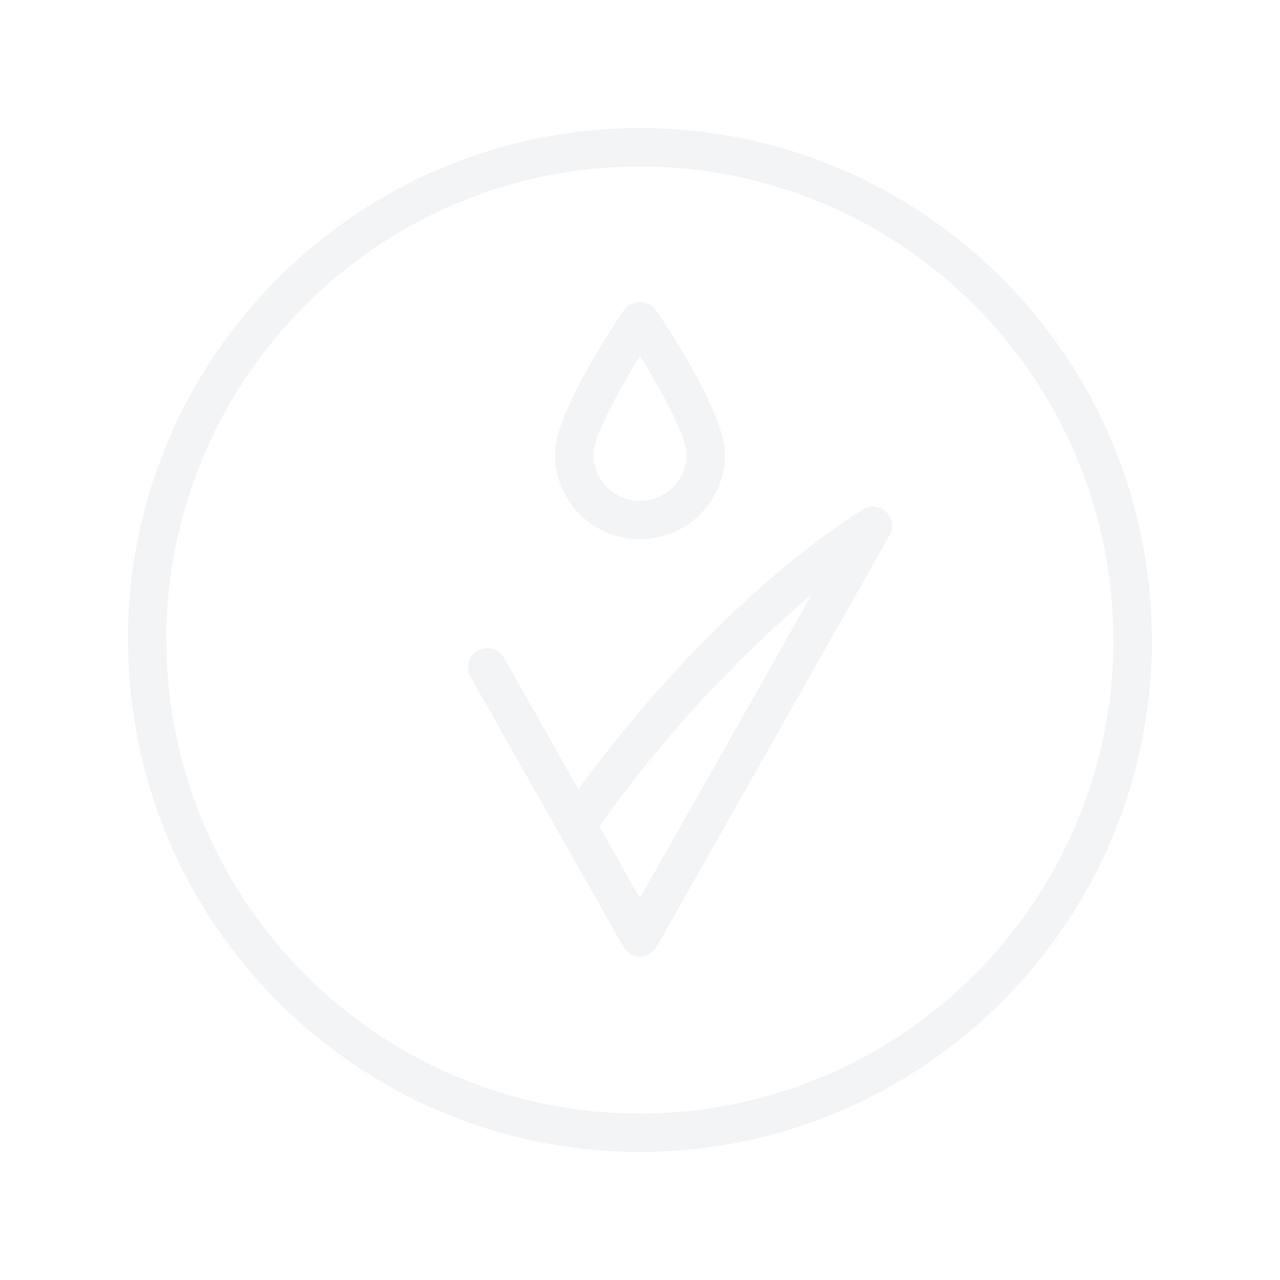 CLINIQUE Beyond Perfecting Powder Foundation+Concealer No.14 Vanilla 14.5g